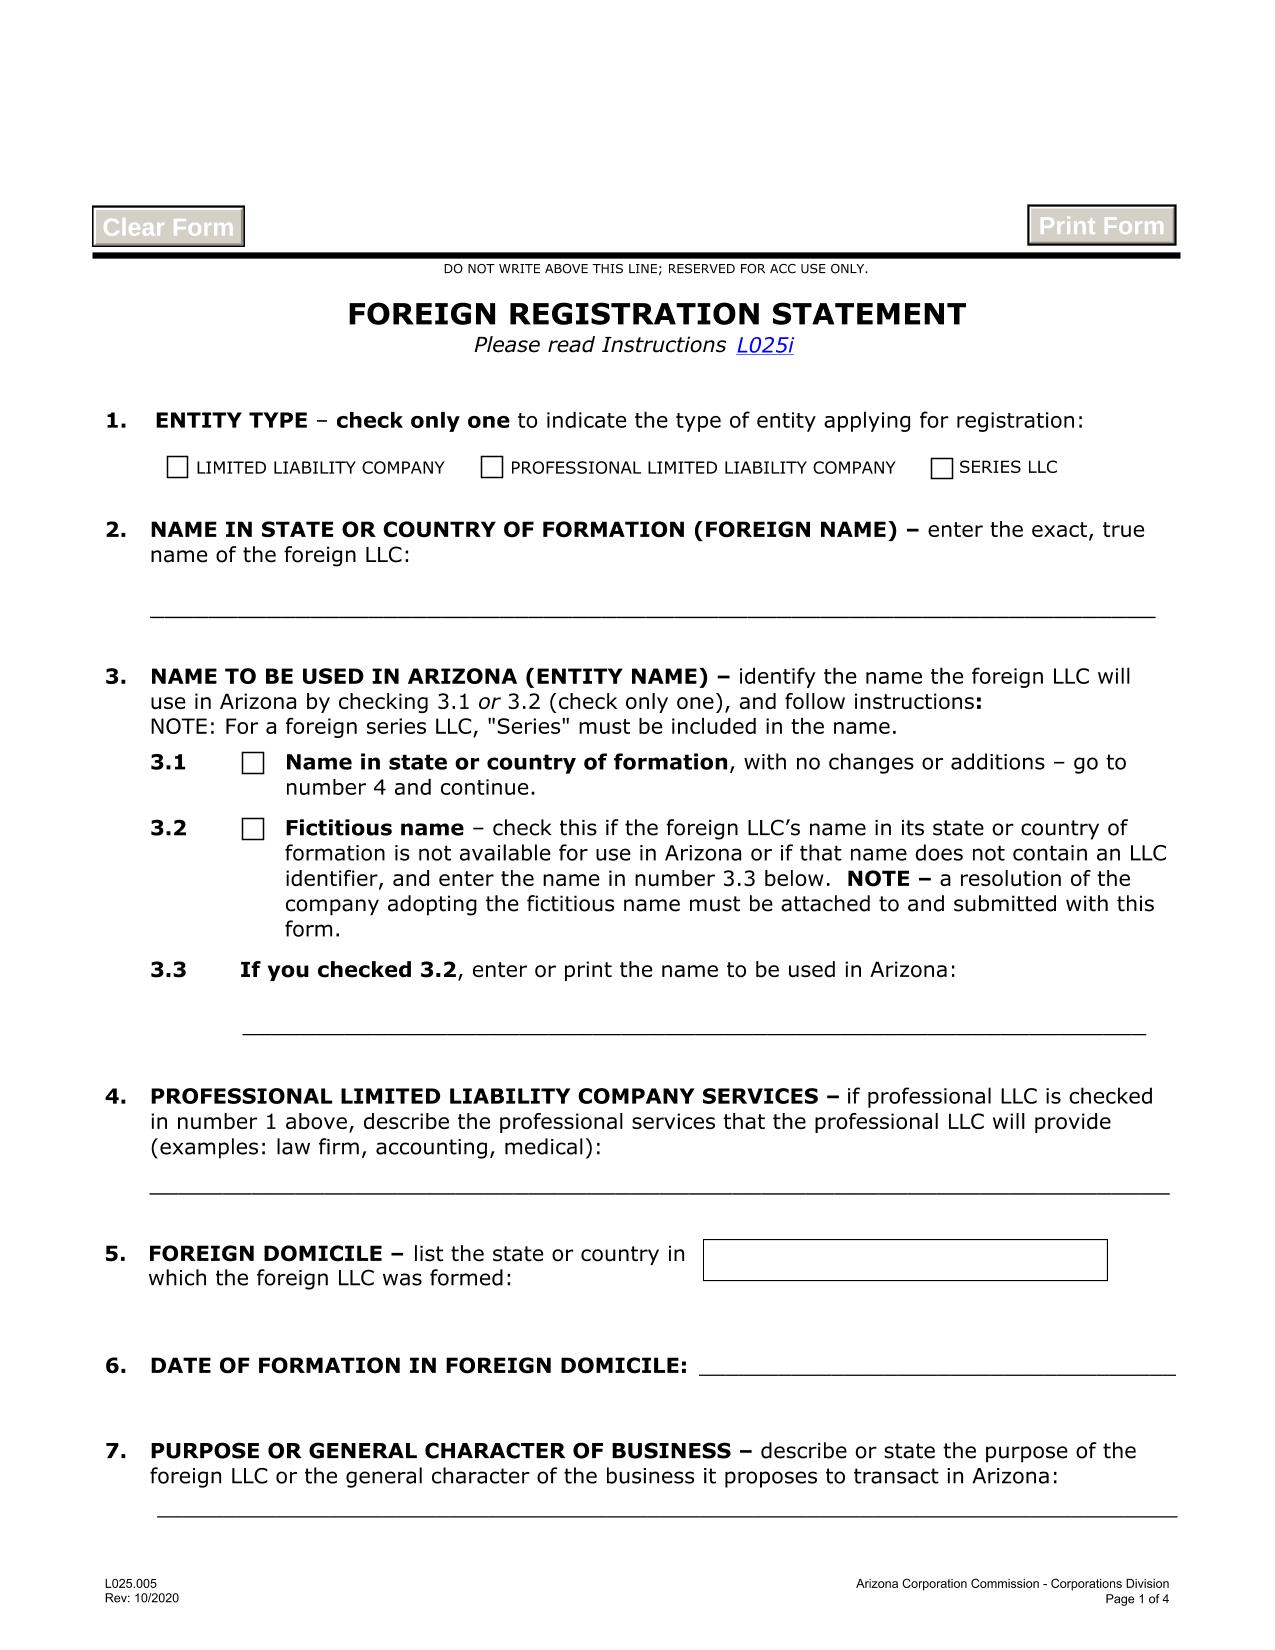 arizona-foreign-llc-registration-statement